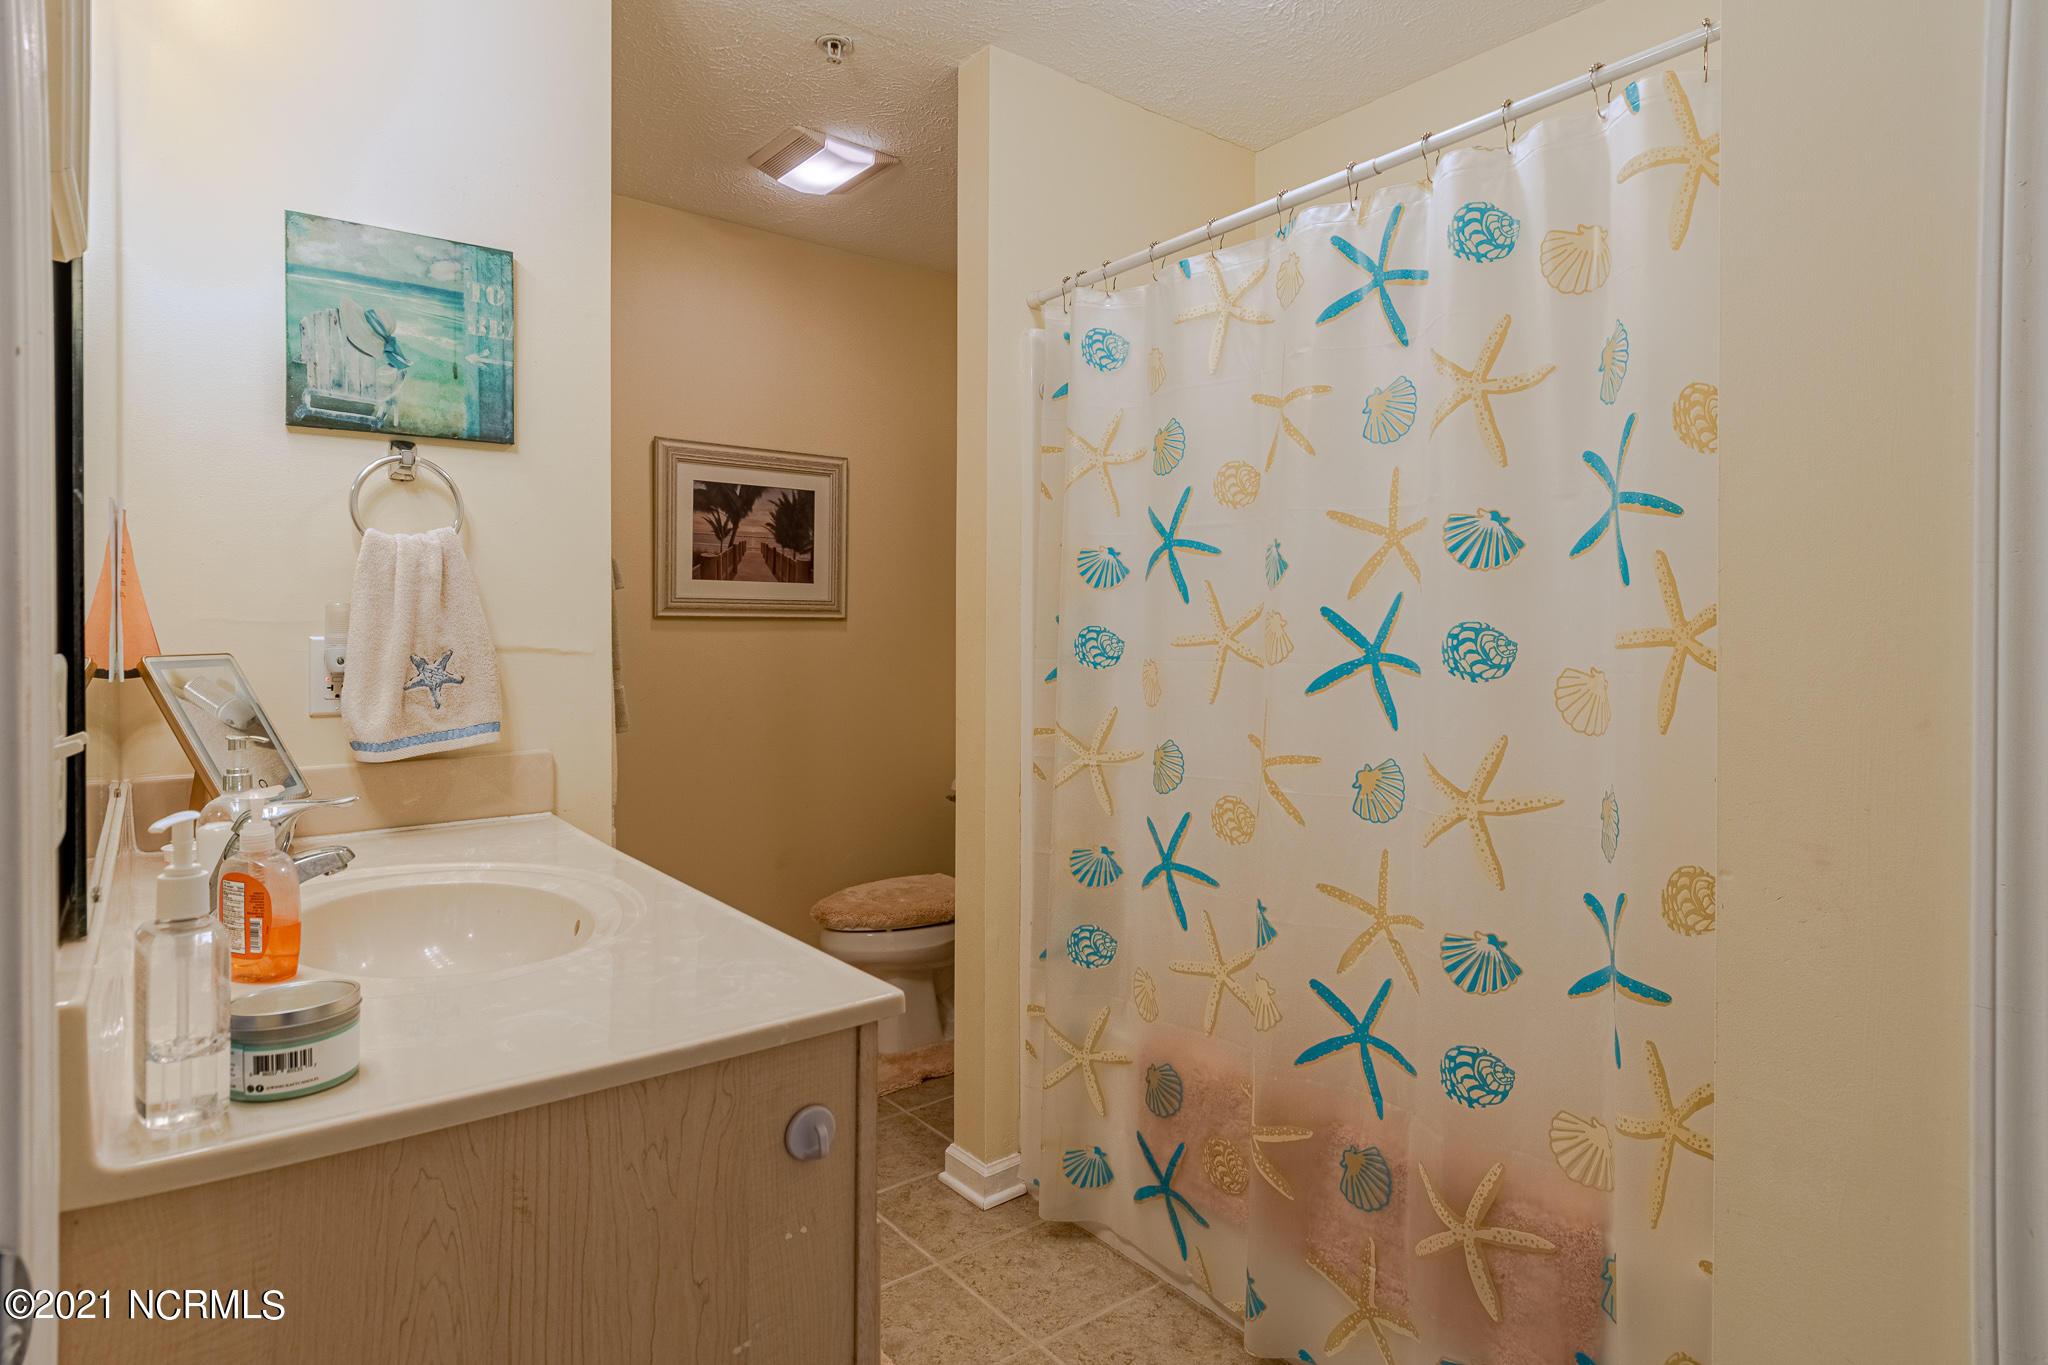 609 Spencer Farlow Drive, Carolina Beach, North Carolina 28428, 2 Bedrooms Bedrooms, 4 Rooms Rooms,2 BathroomsBathrooms,Condominium,For sale,Spencer Farlow,100264368